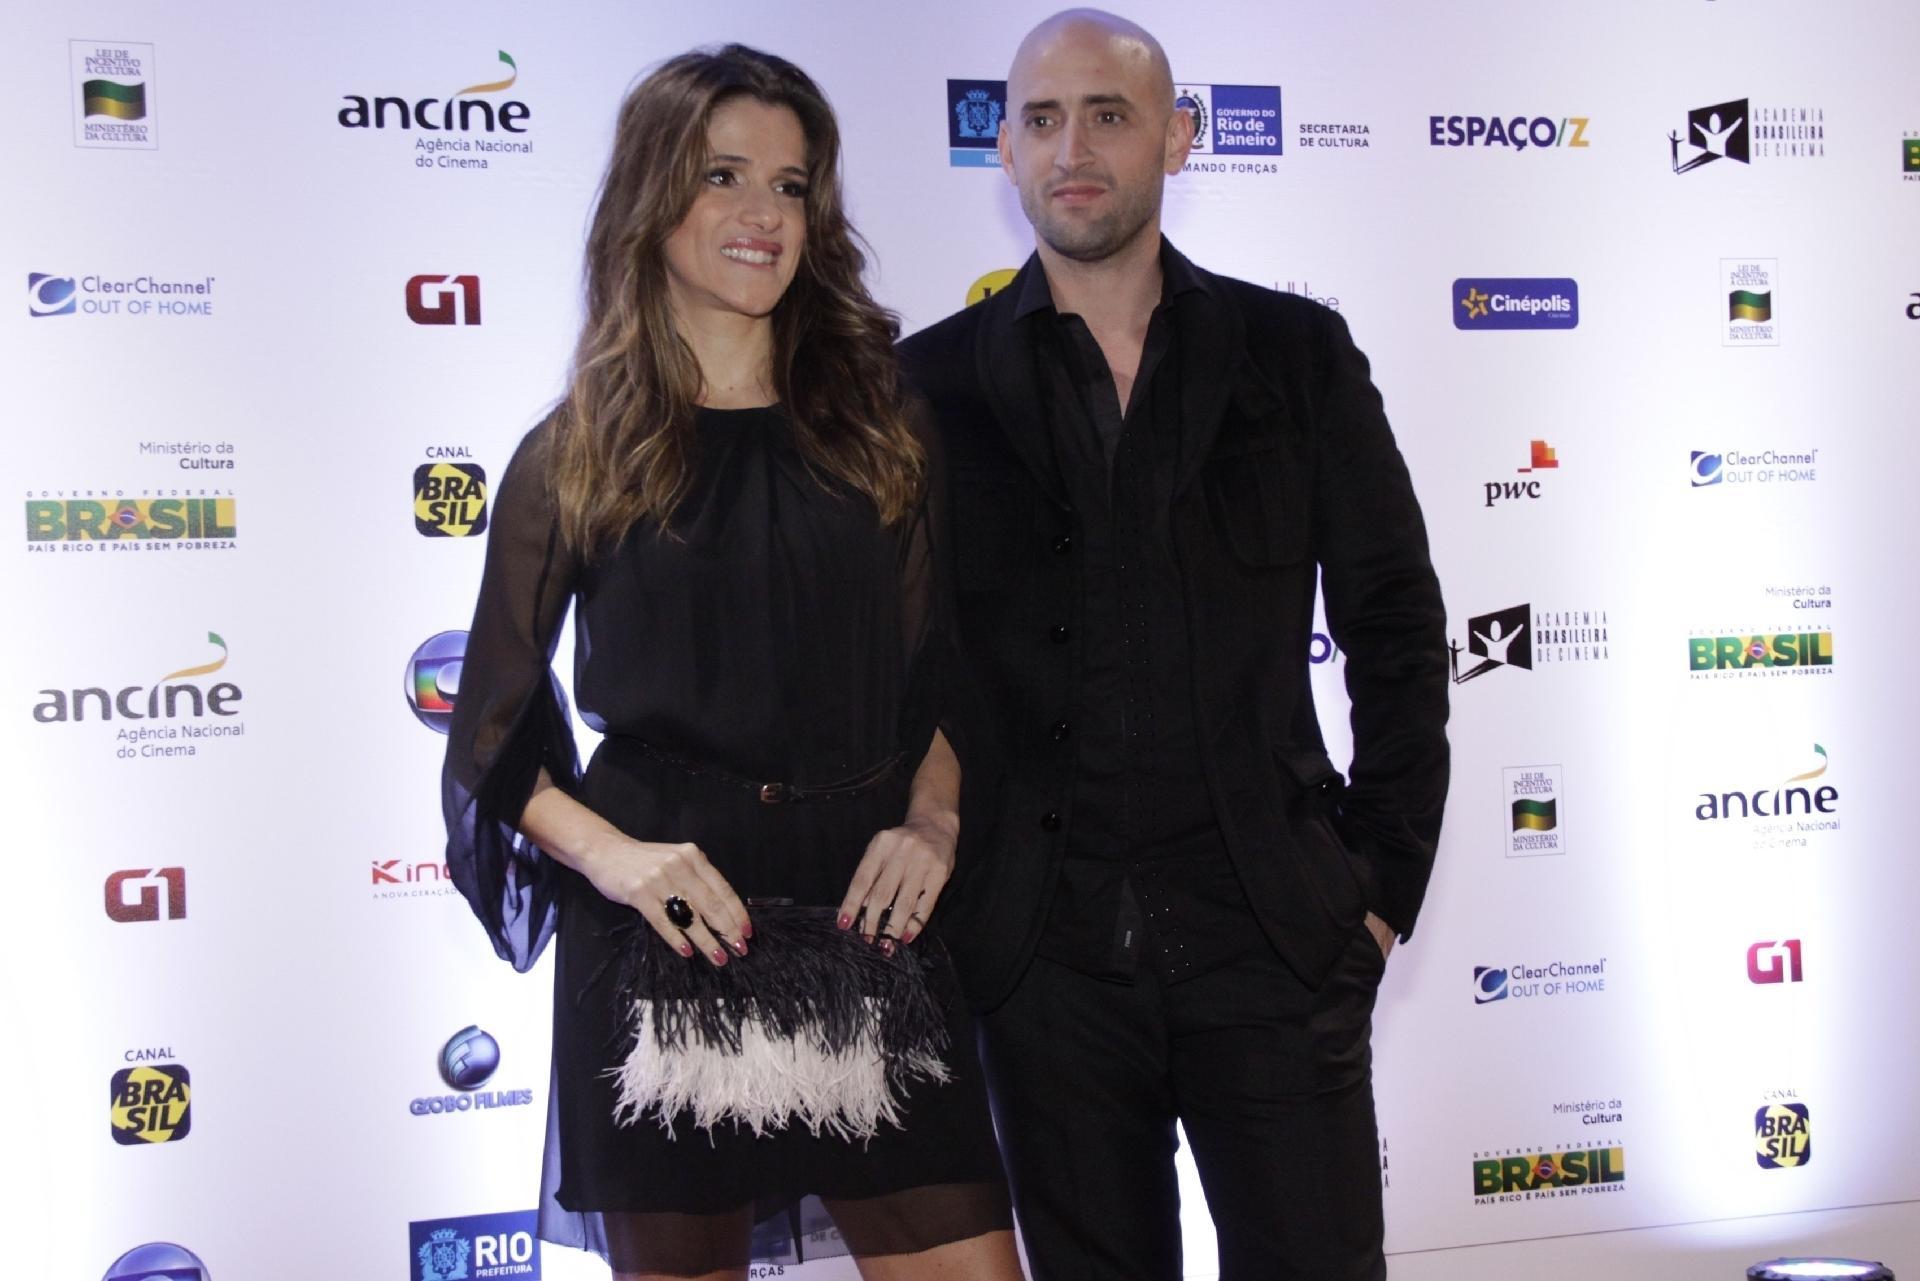 Paulo Gustavo con la sua fidanzata Ingrid Guimarães - AG NEWS